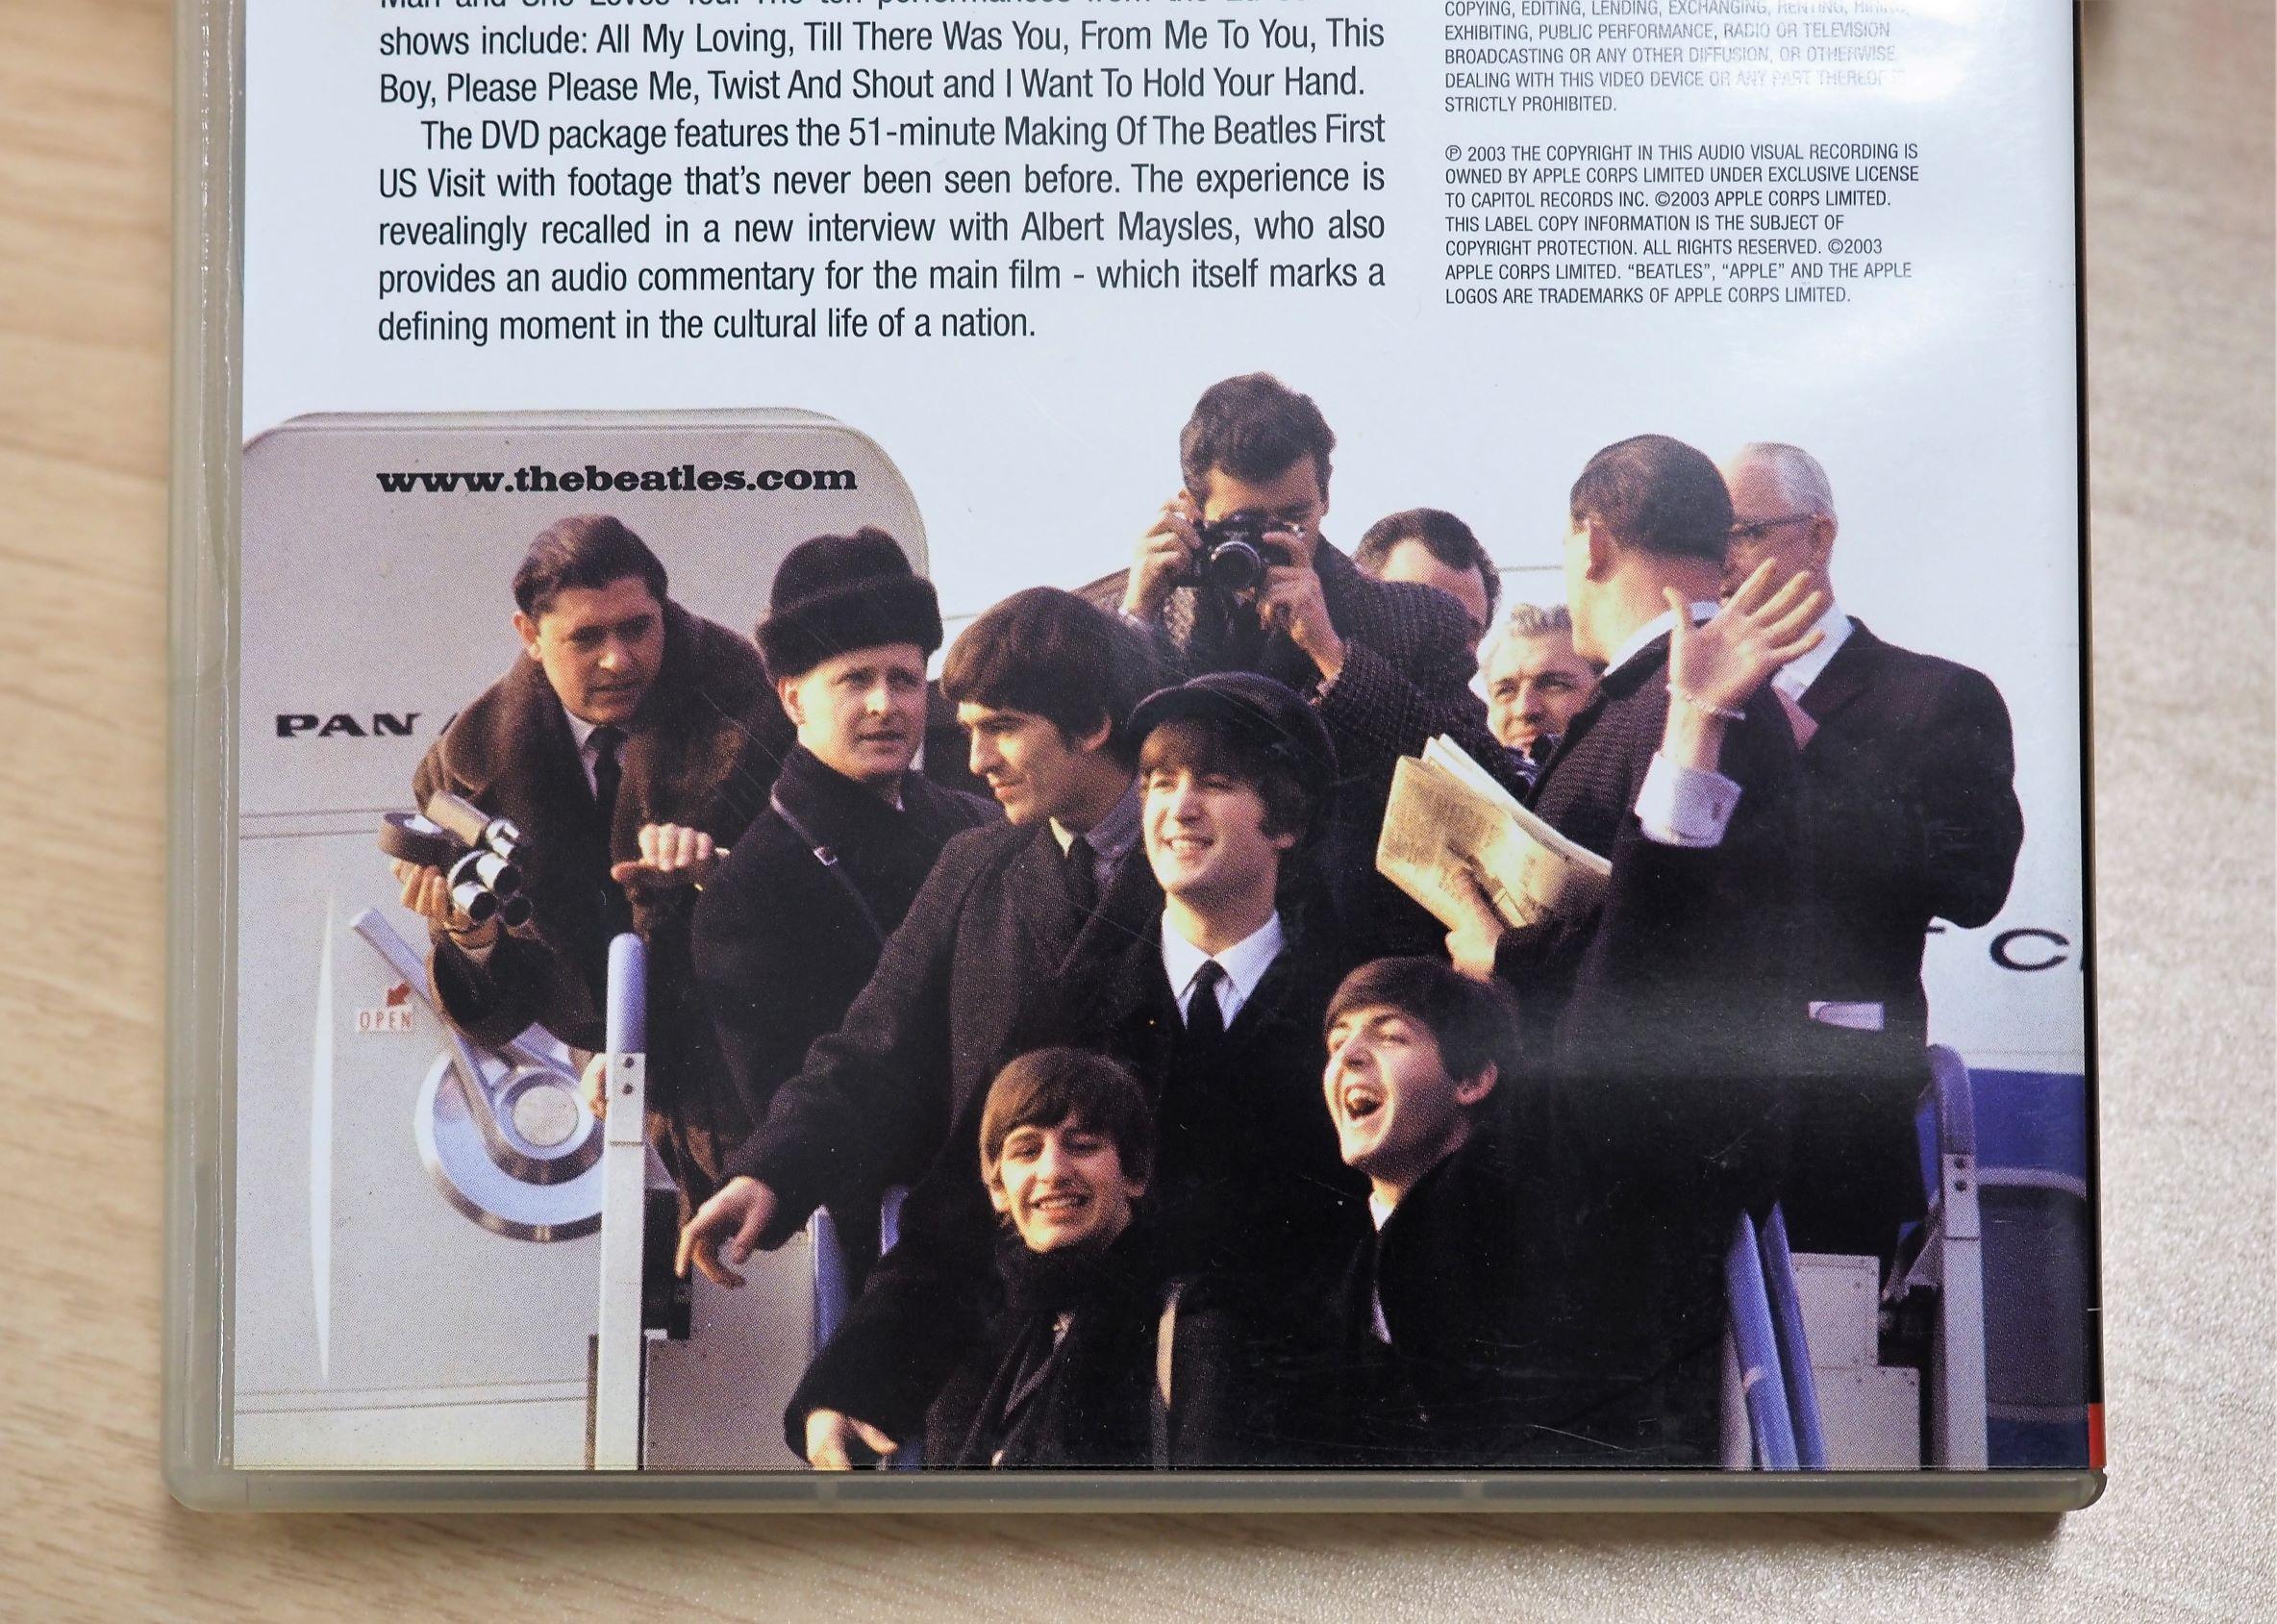 DVD『THE FIRST U.S. VISIT』(EMI)のジャケット裏面に載っているビートルズ初訪米時の写真。